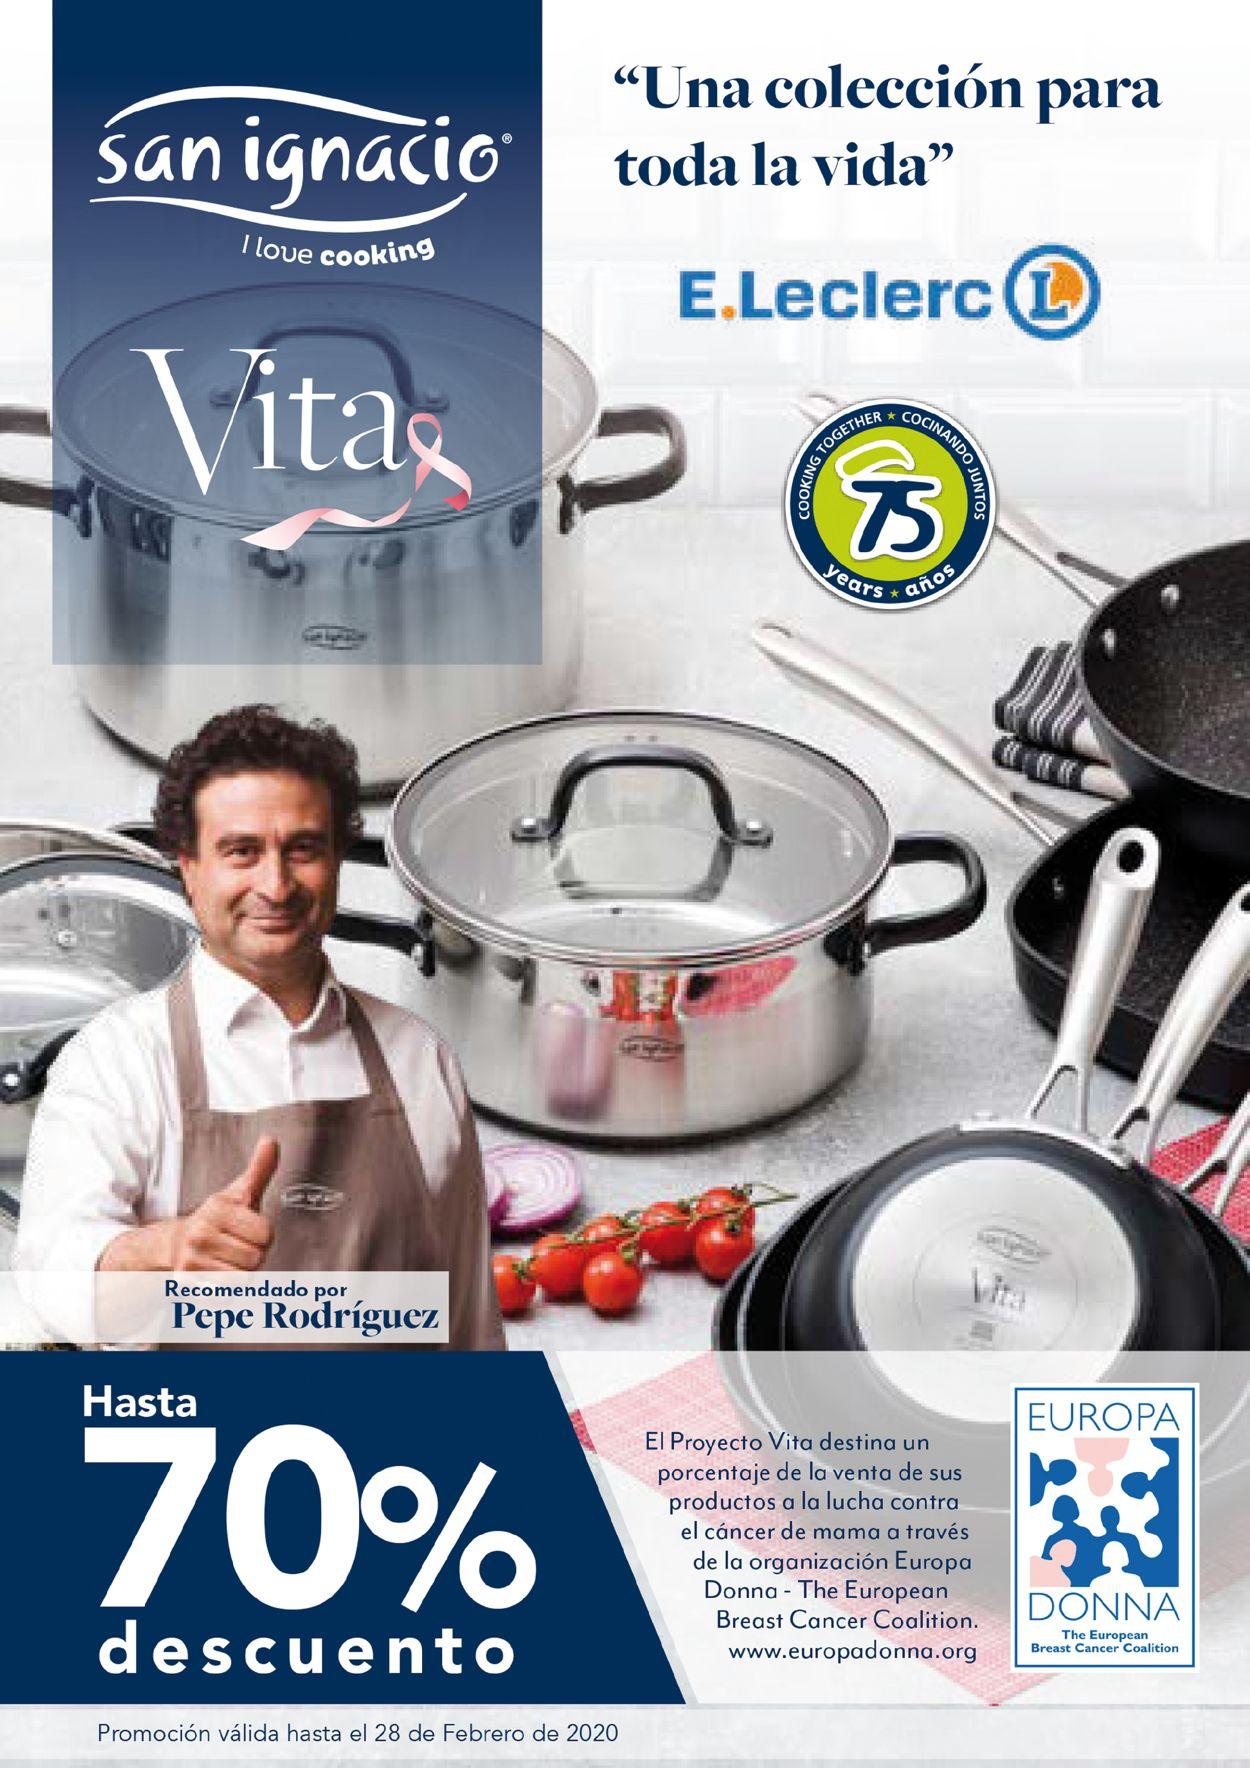 E.leclerc Folleto - 02.12-28.02.2020